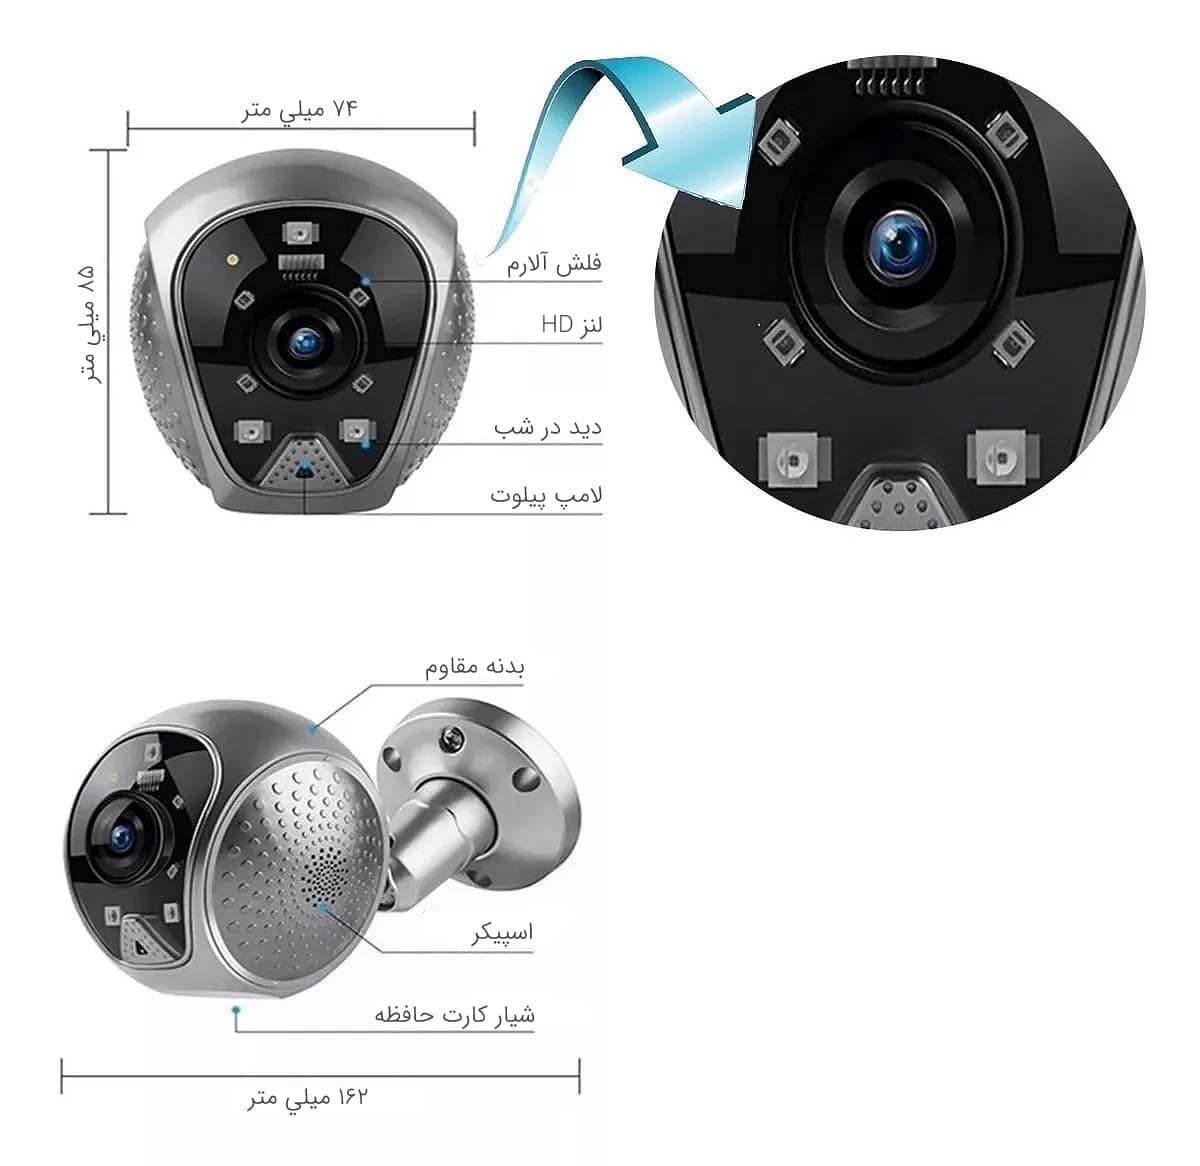 دوربین مداربسته Q19